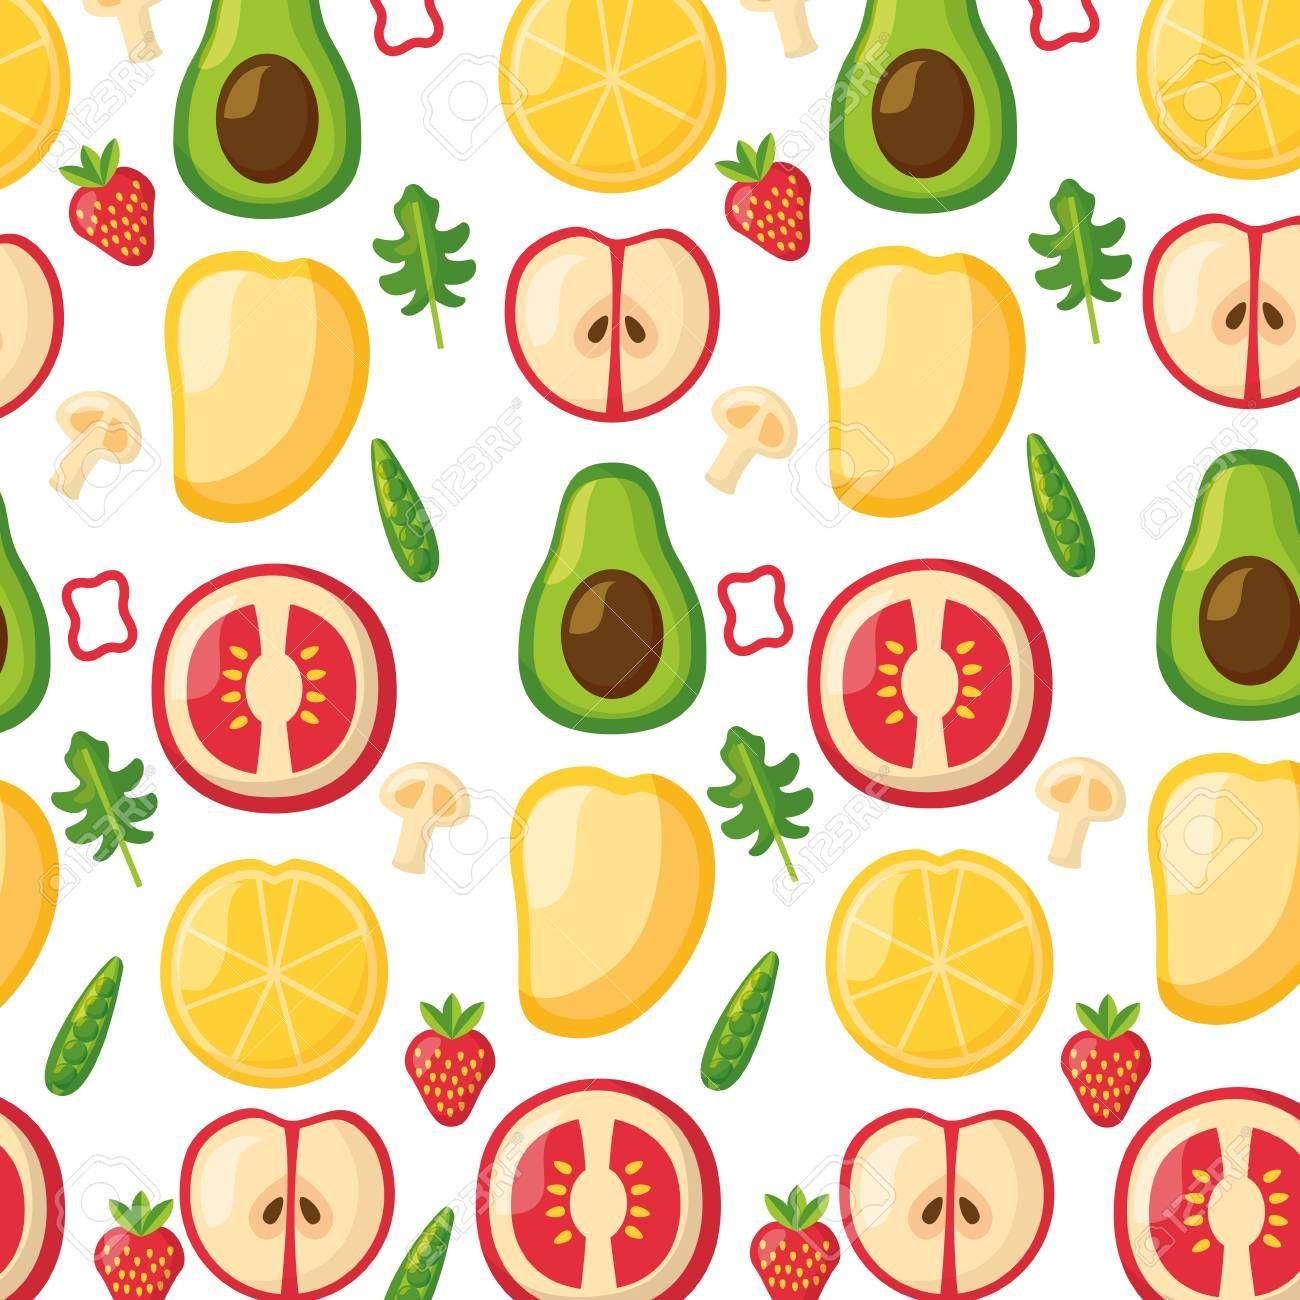 Healthy Food Background Fruits Vegetables Vector Illustration Illustration Aff Background Healthy Food Blogs Food Backgrounds Food Background Wallpapers